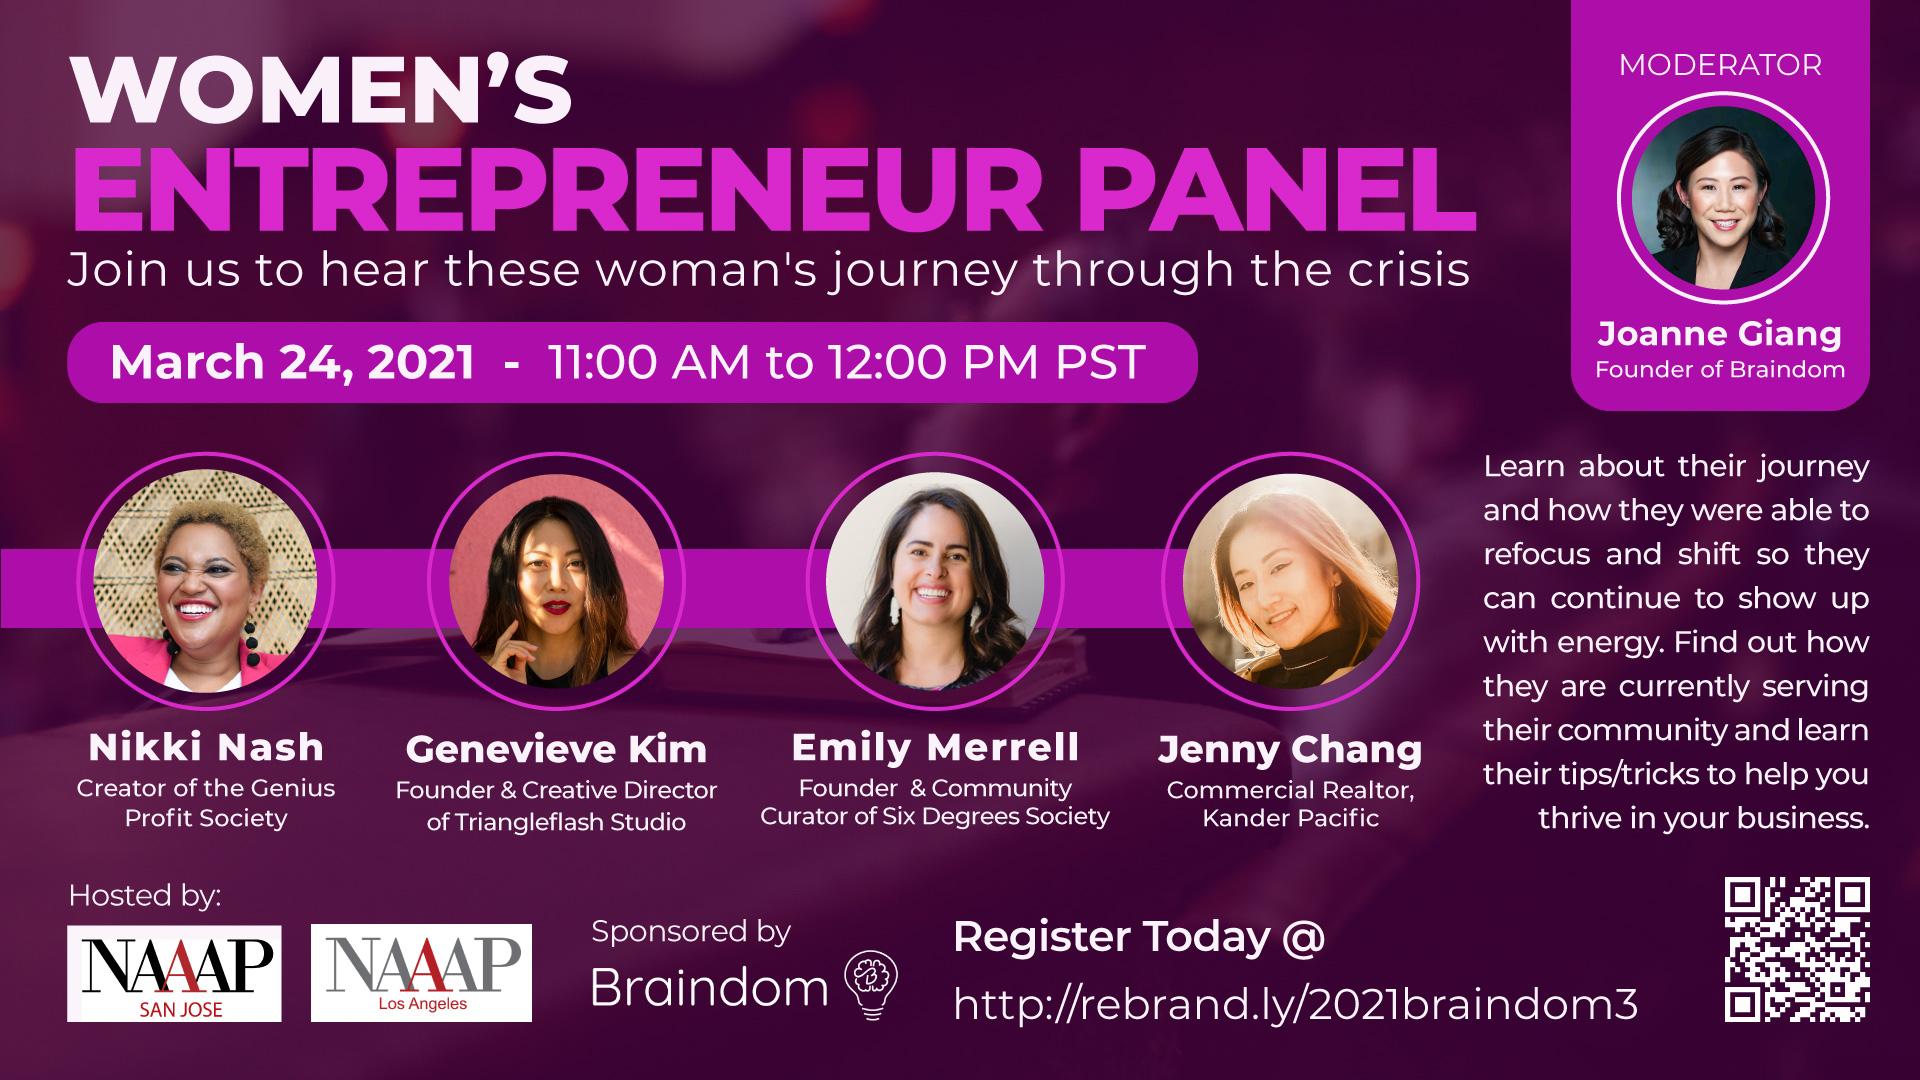 March Webinar about Four Women Entreprenuers